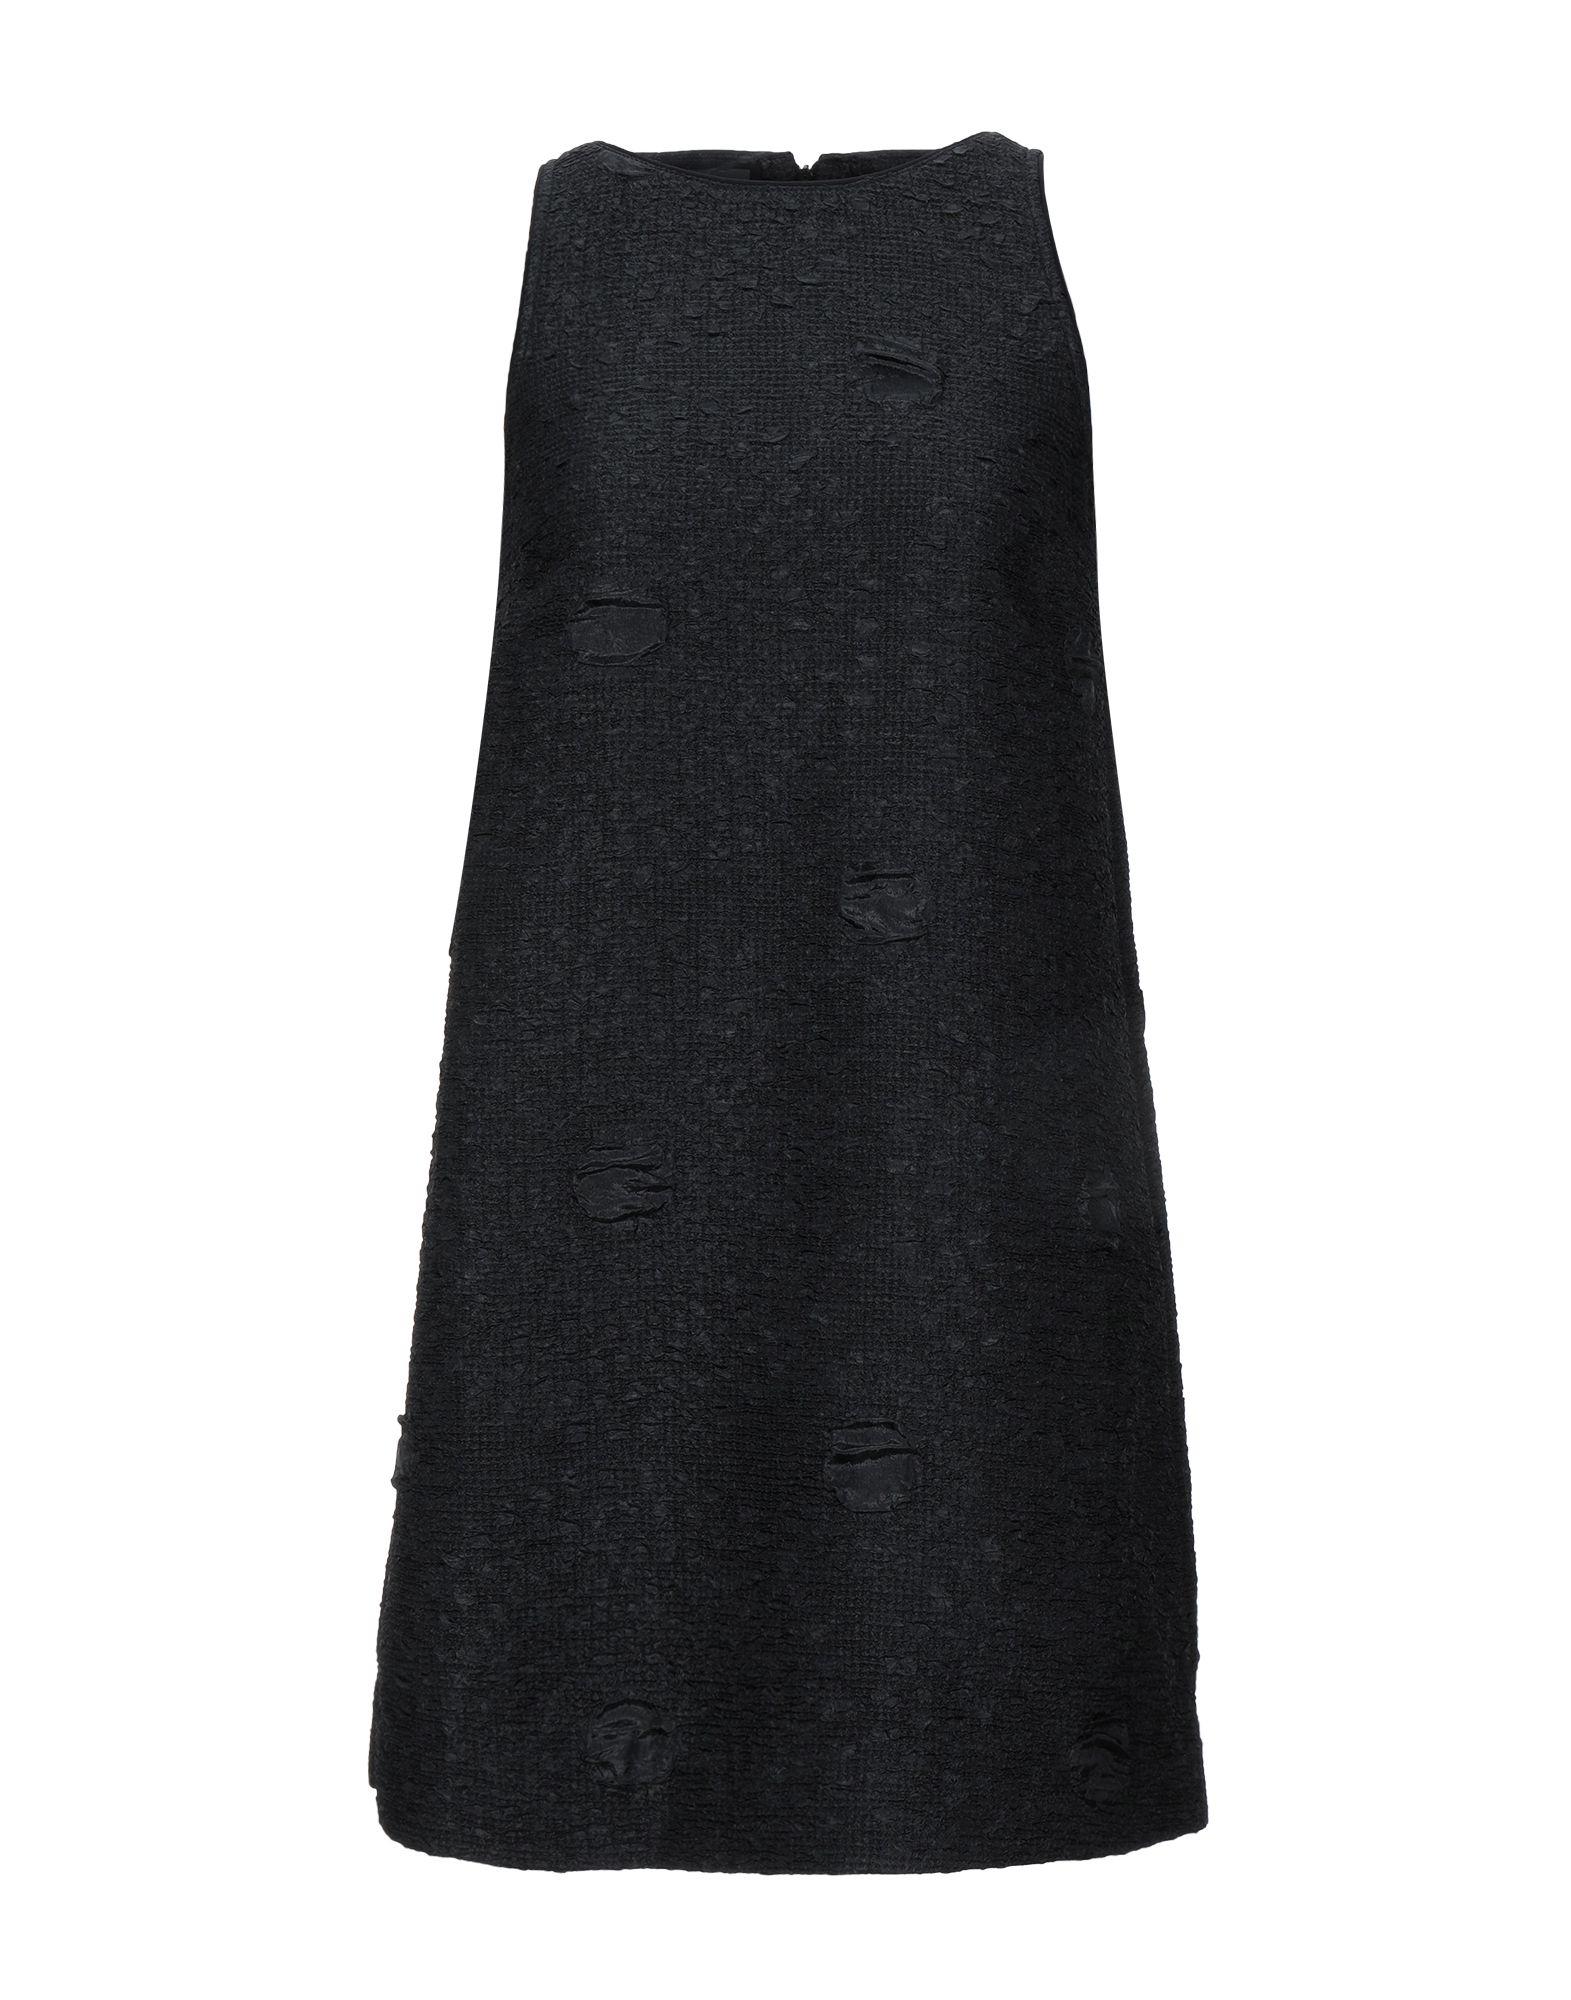 UP TO BE Короткое платье